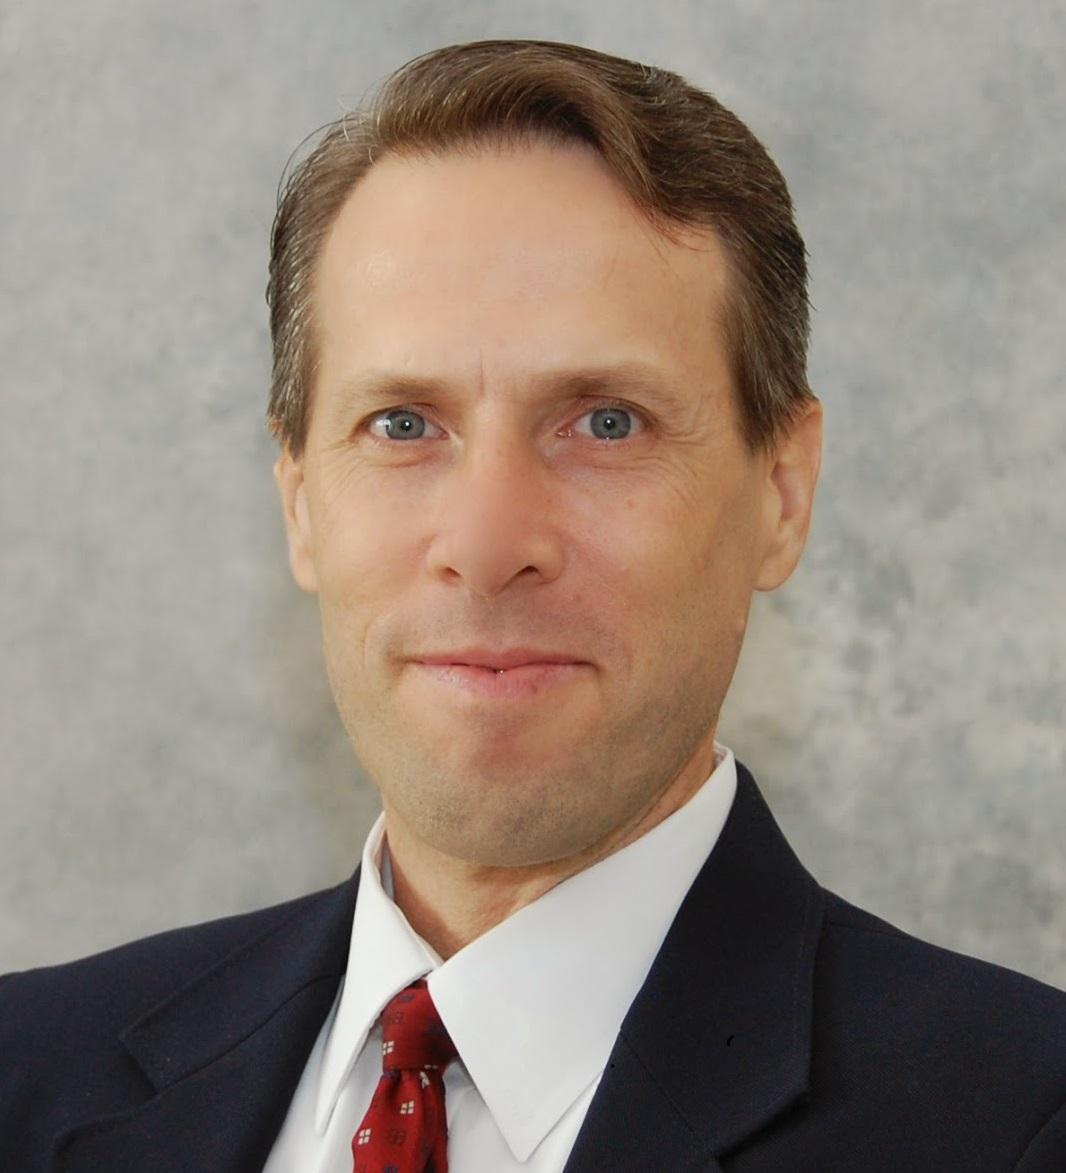 David Schimp